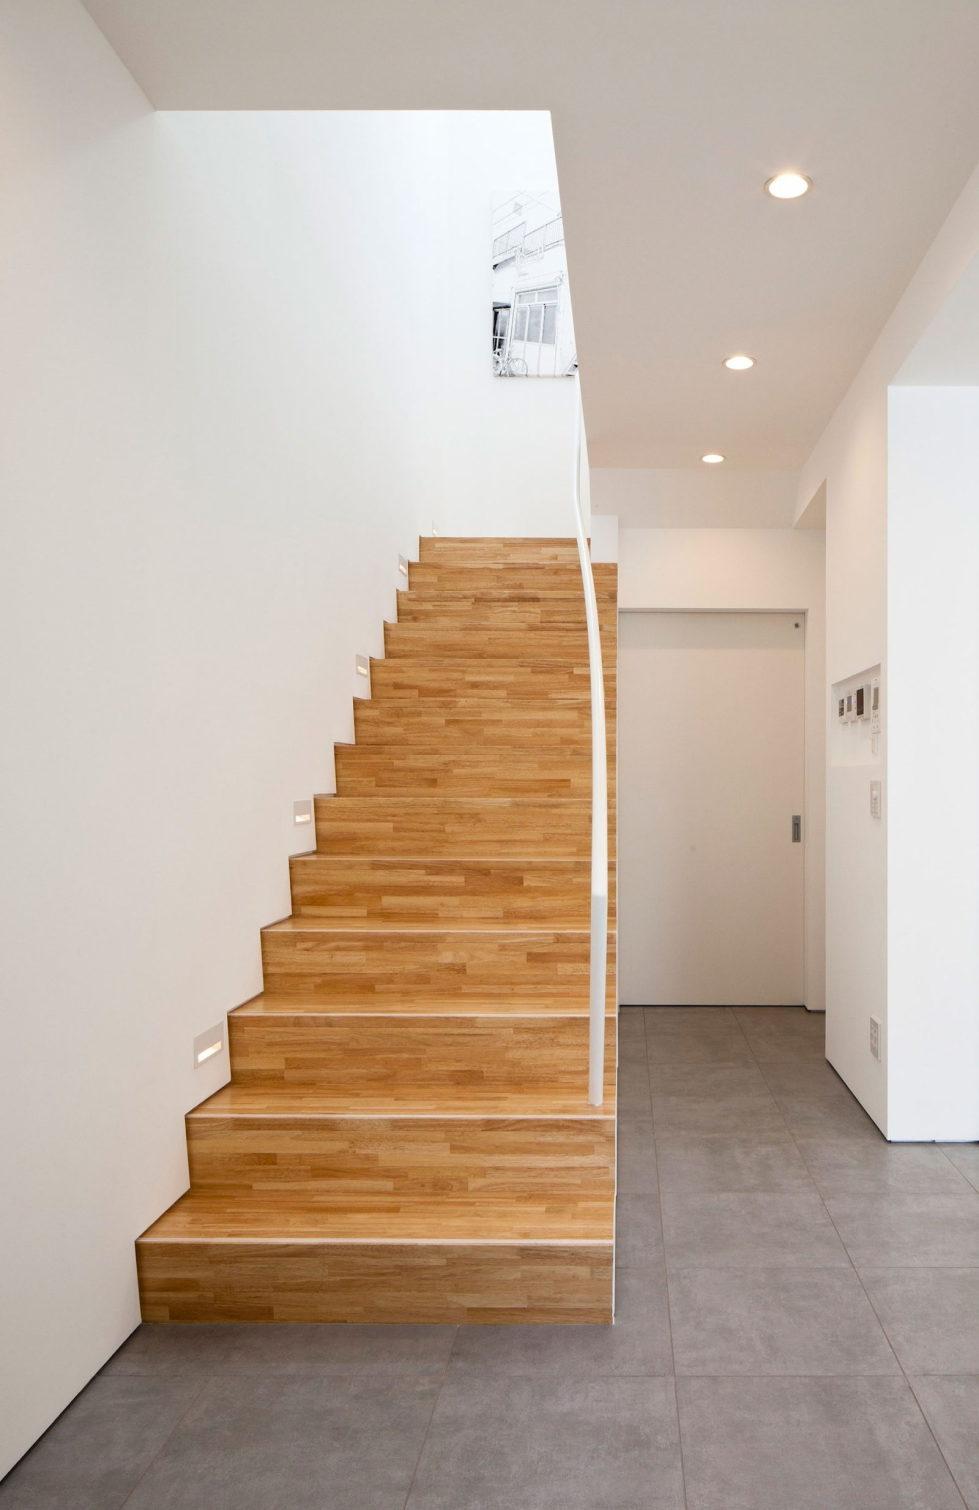 Zen Design House From RCK Design Studio In Japan 16